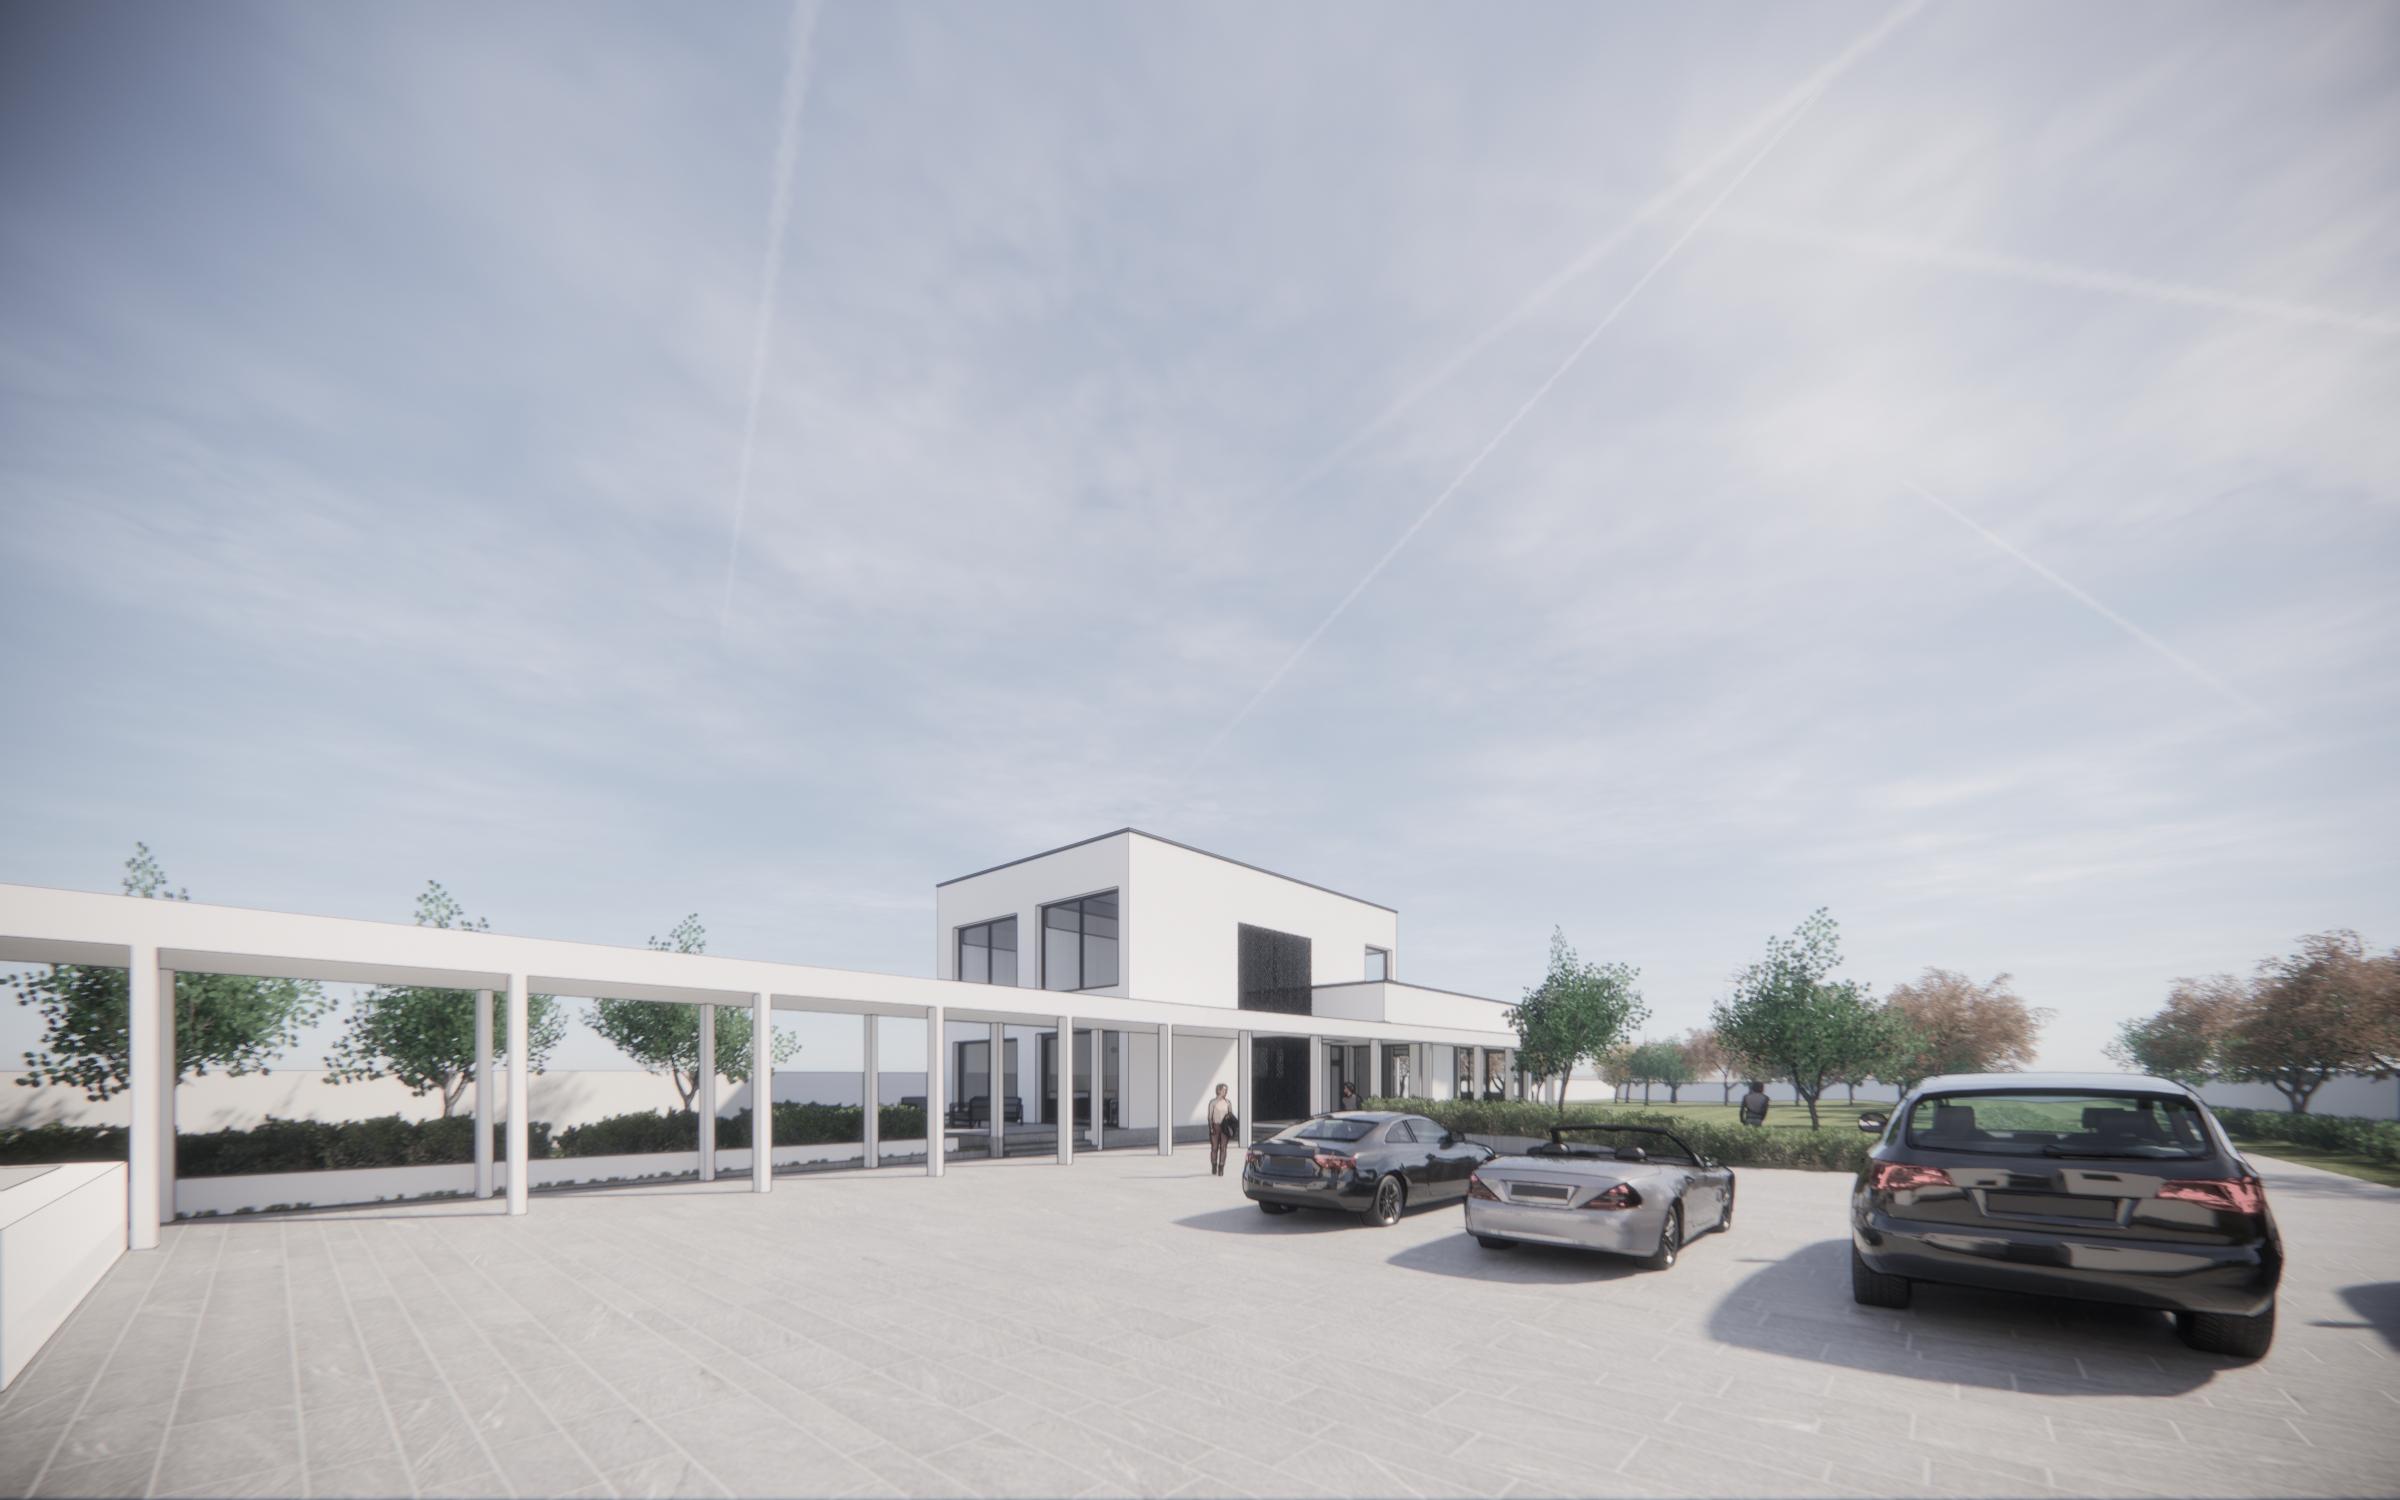 https://nbc-arhitect.ro/wp-content/uploads/2020/11/NBC-Arhitect-_-residential-_-2x-Snagov-_-Snagov-Romania_3.jpg